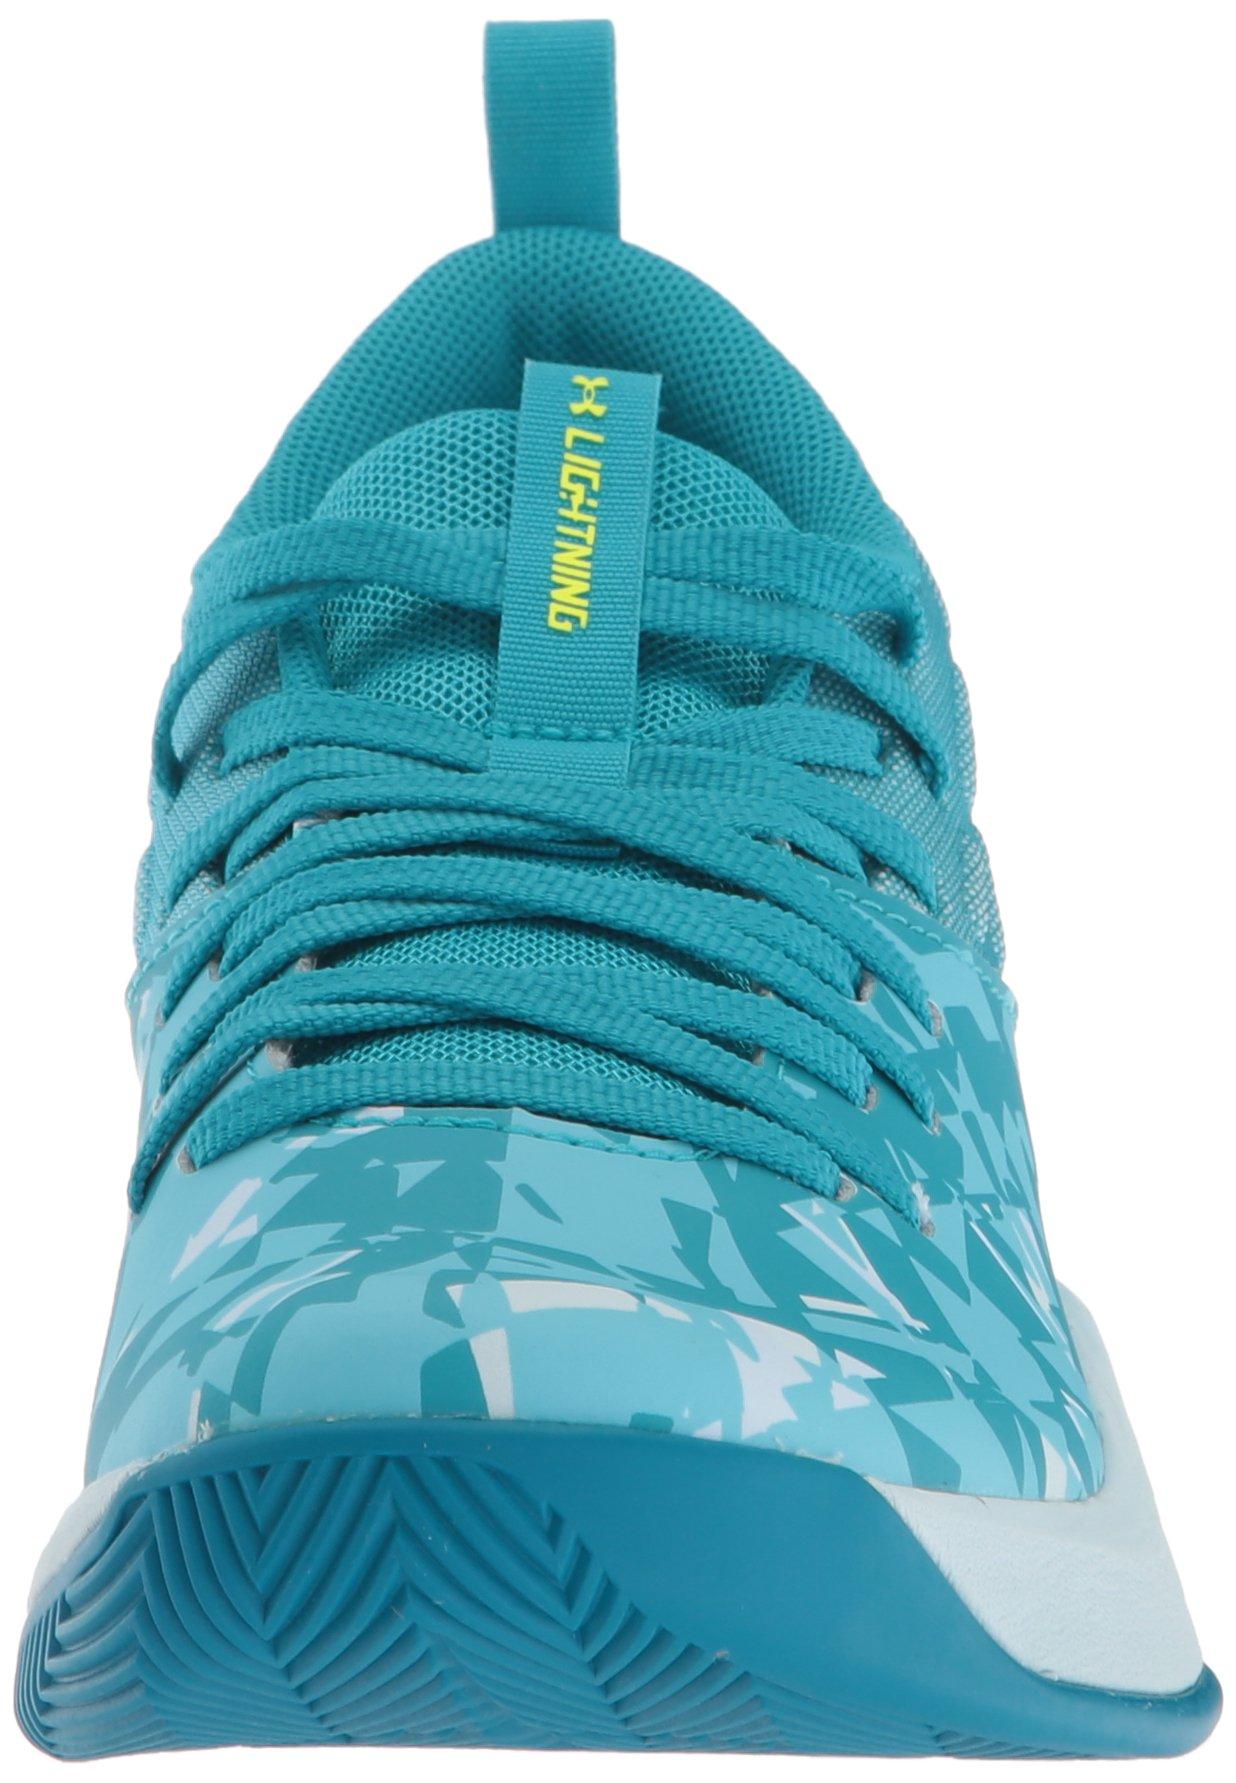 Under Armour Girls' Grade School Lightning 5 Basketball Shoe, Deceit (300)/Halogen Blue, 5.5 by Under Armour (Image #4)